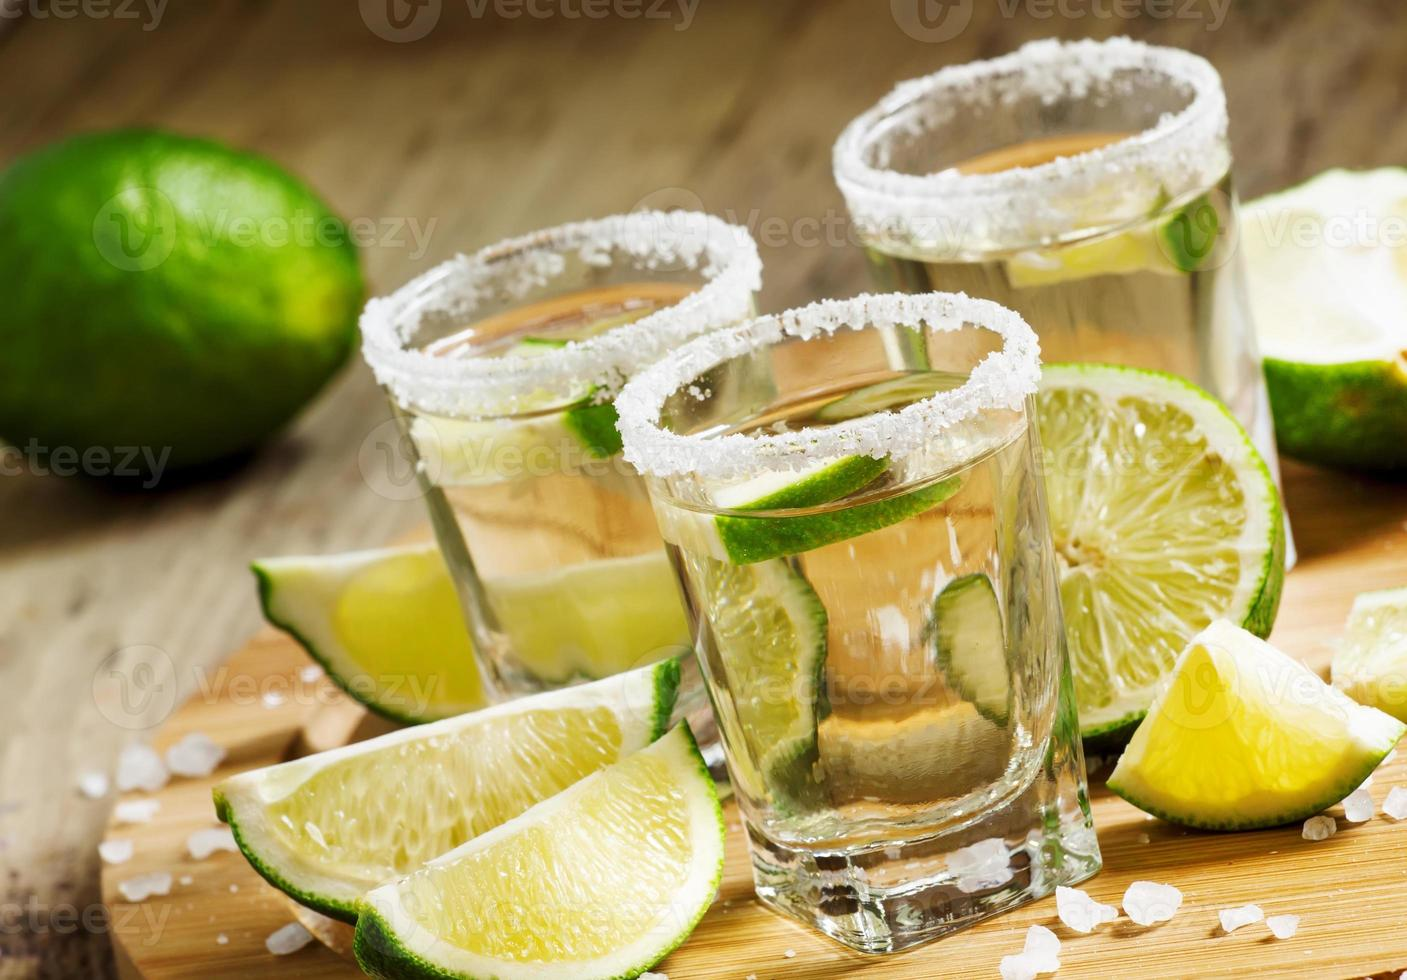 tequila messicana d'argento con lime e sale foto